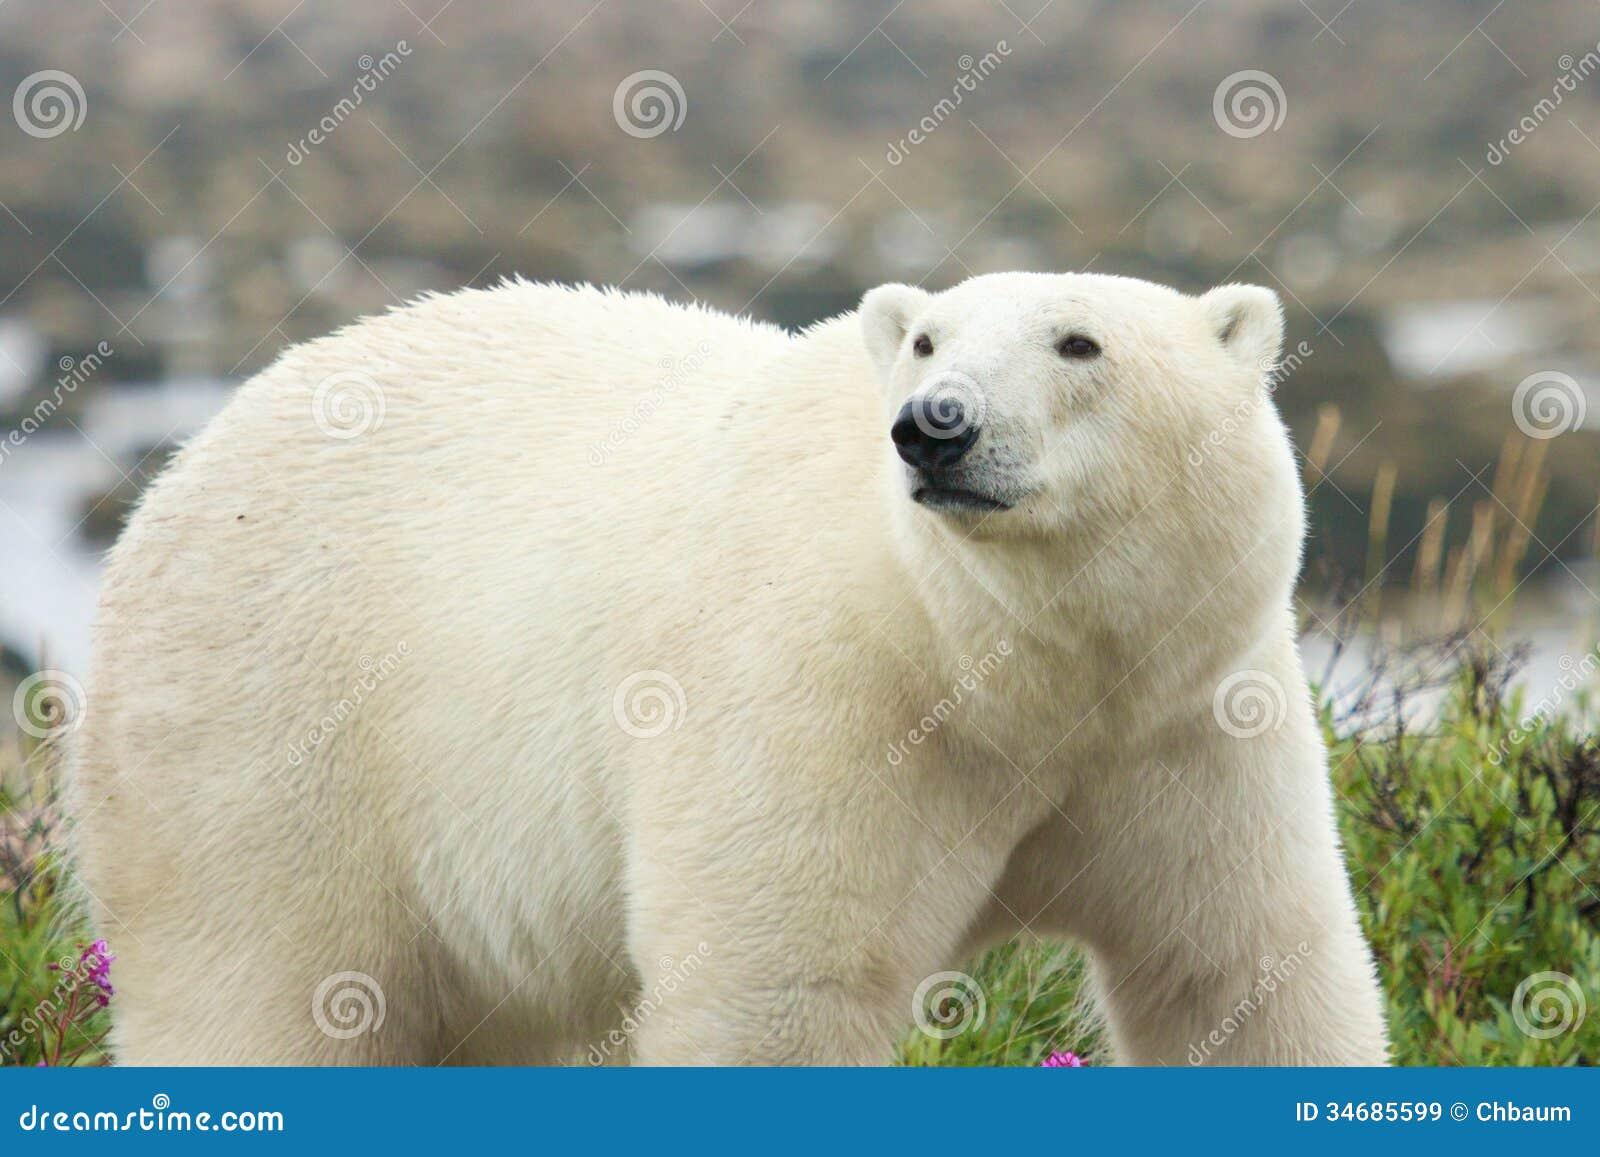 Полярный медведь на вахте